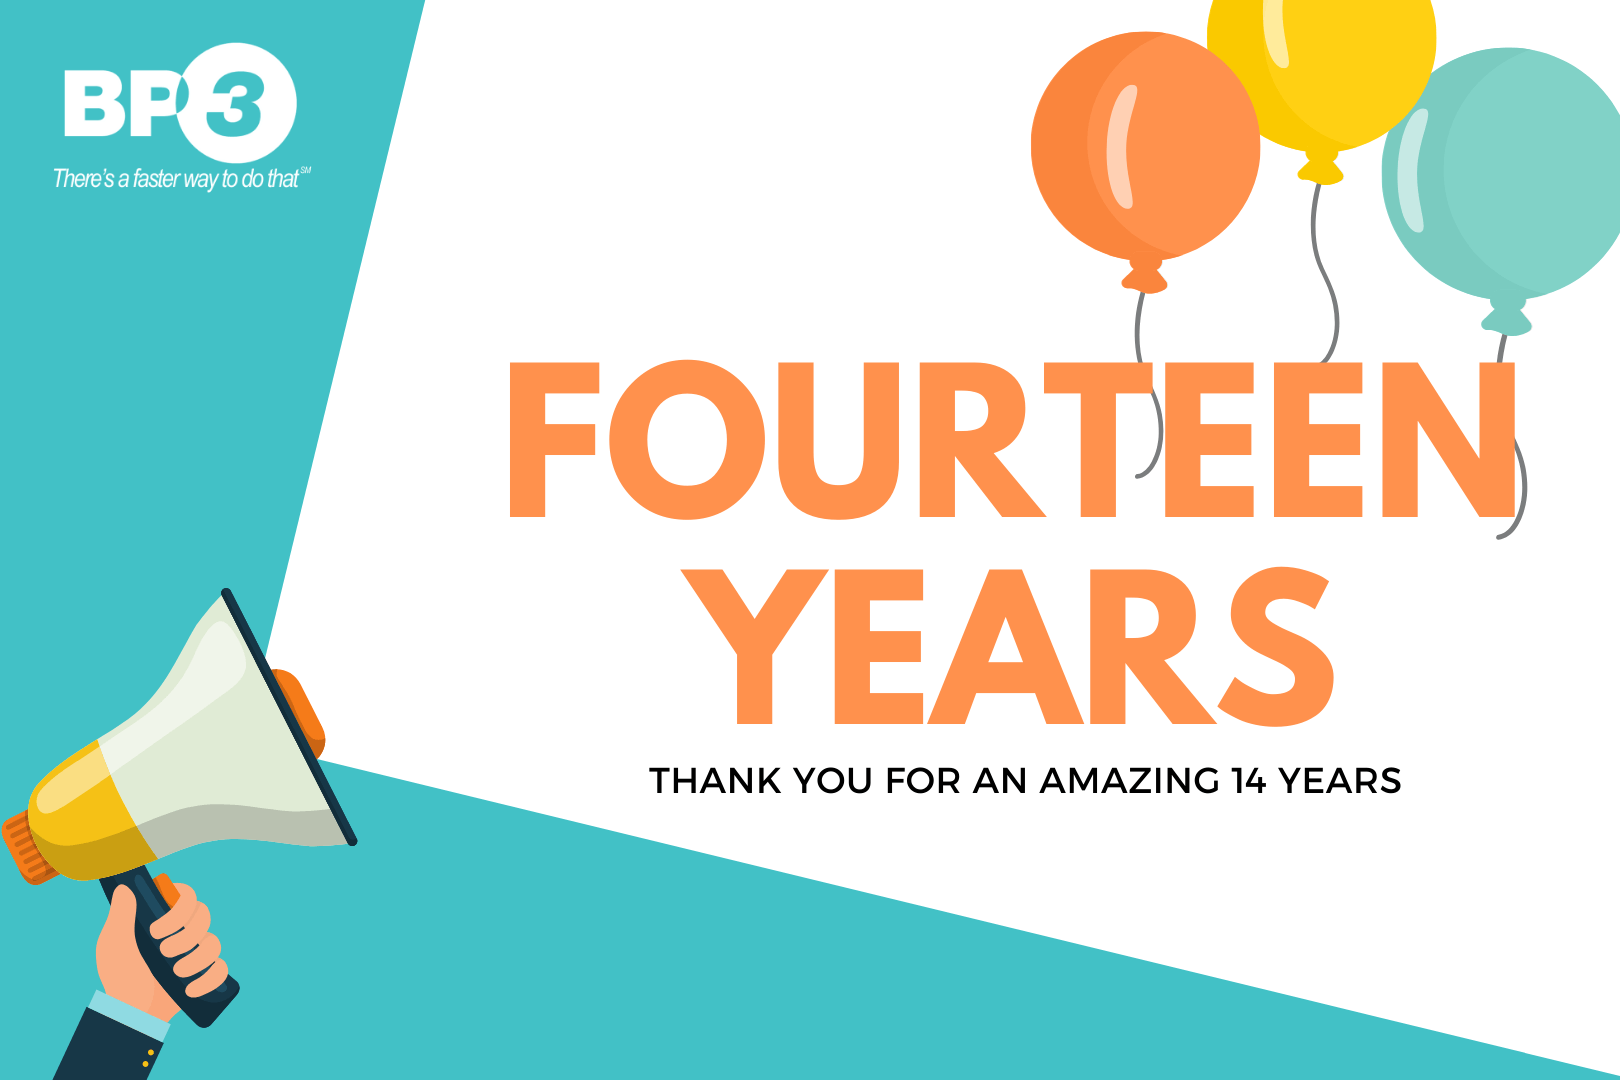 BP3 Global, Inc. - Celebrating 14 years in business!